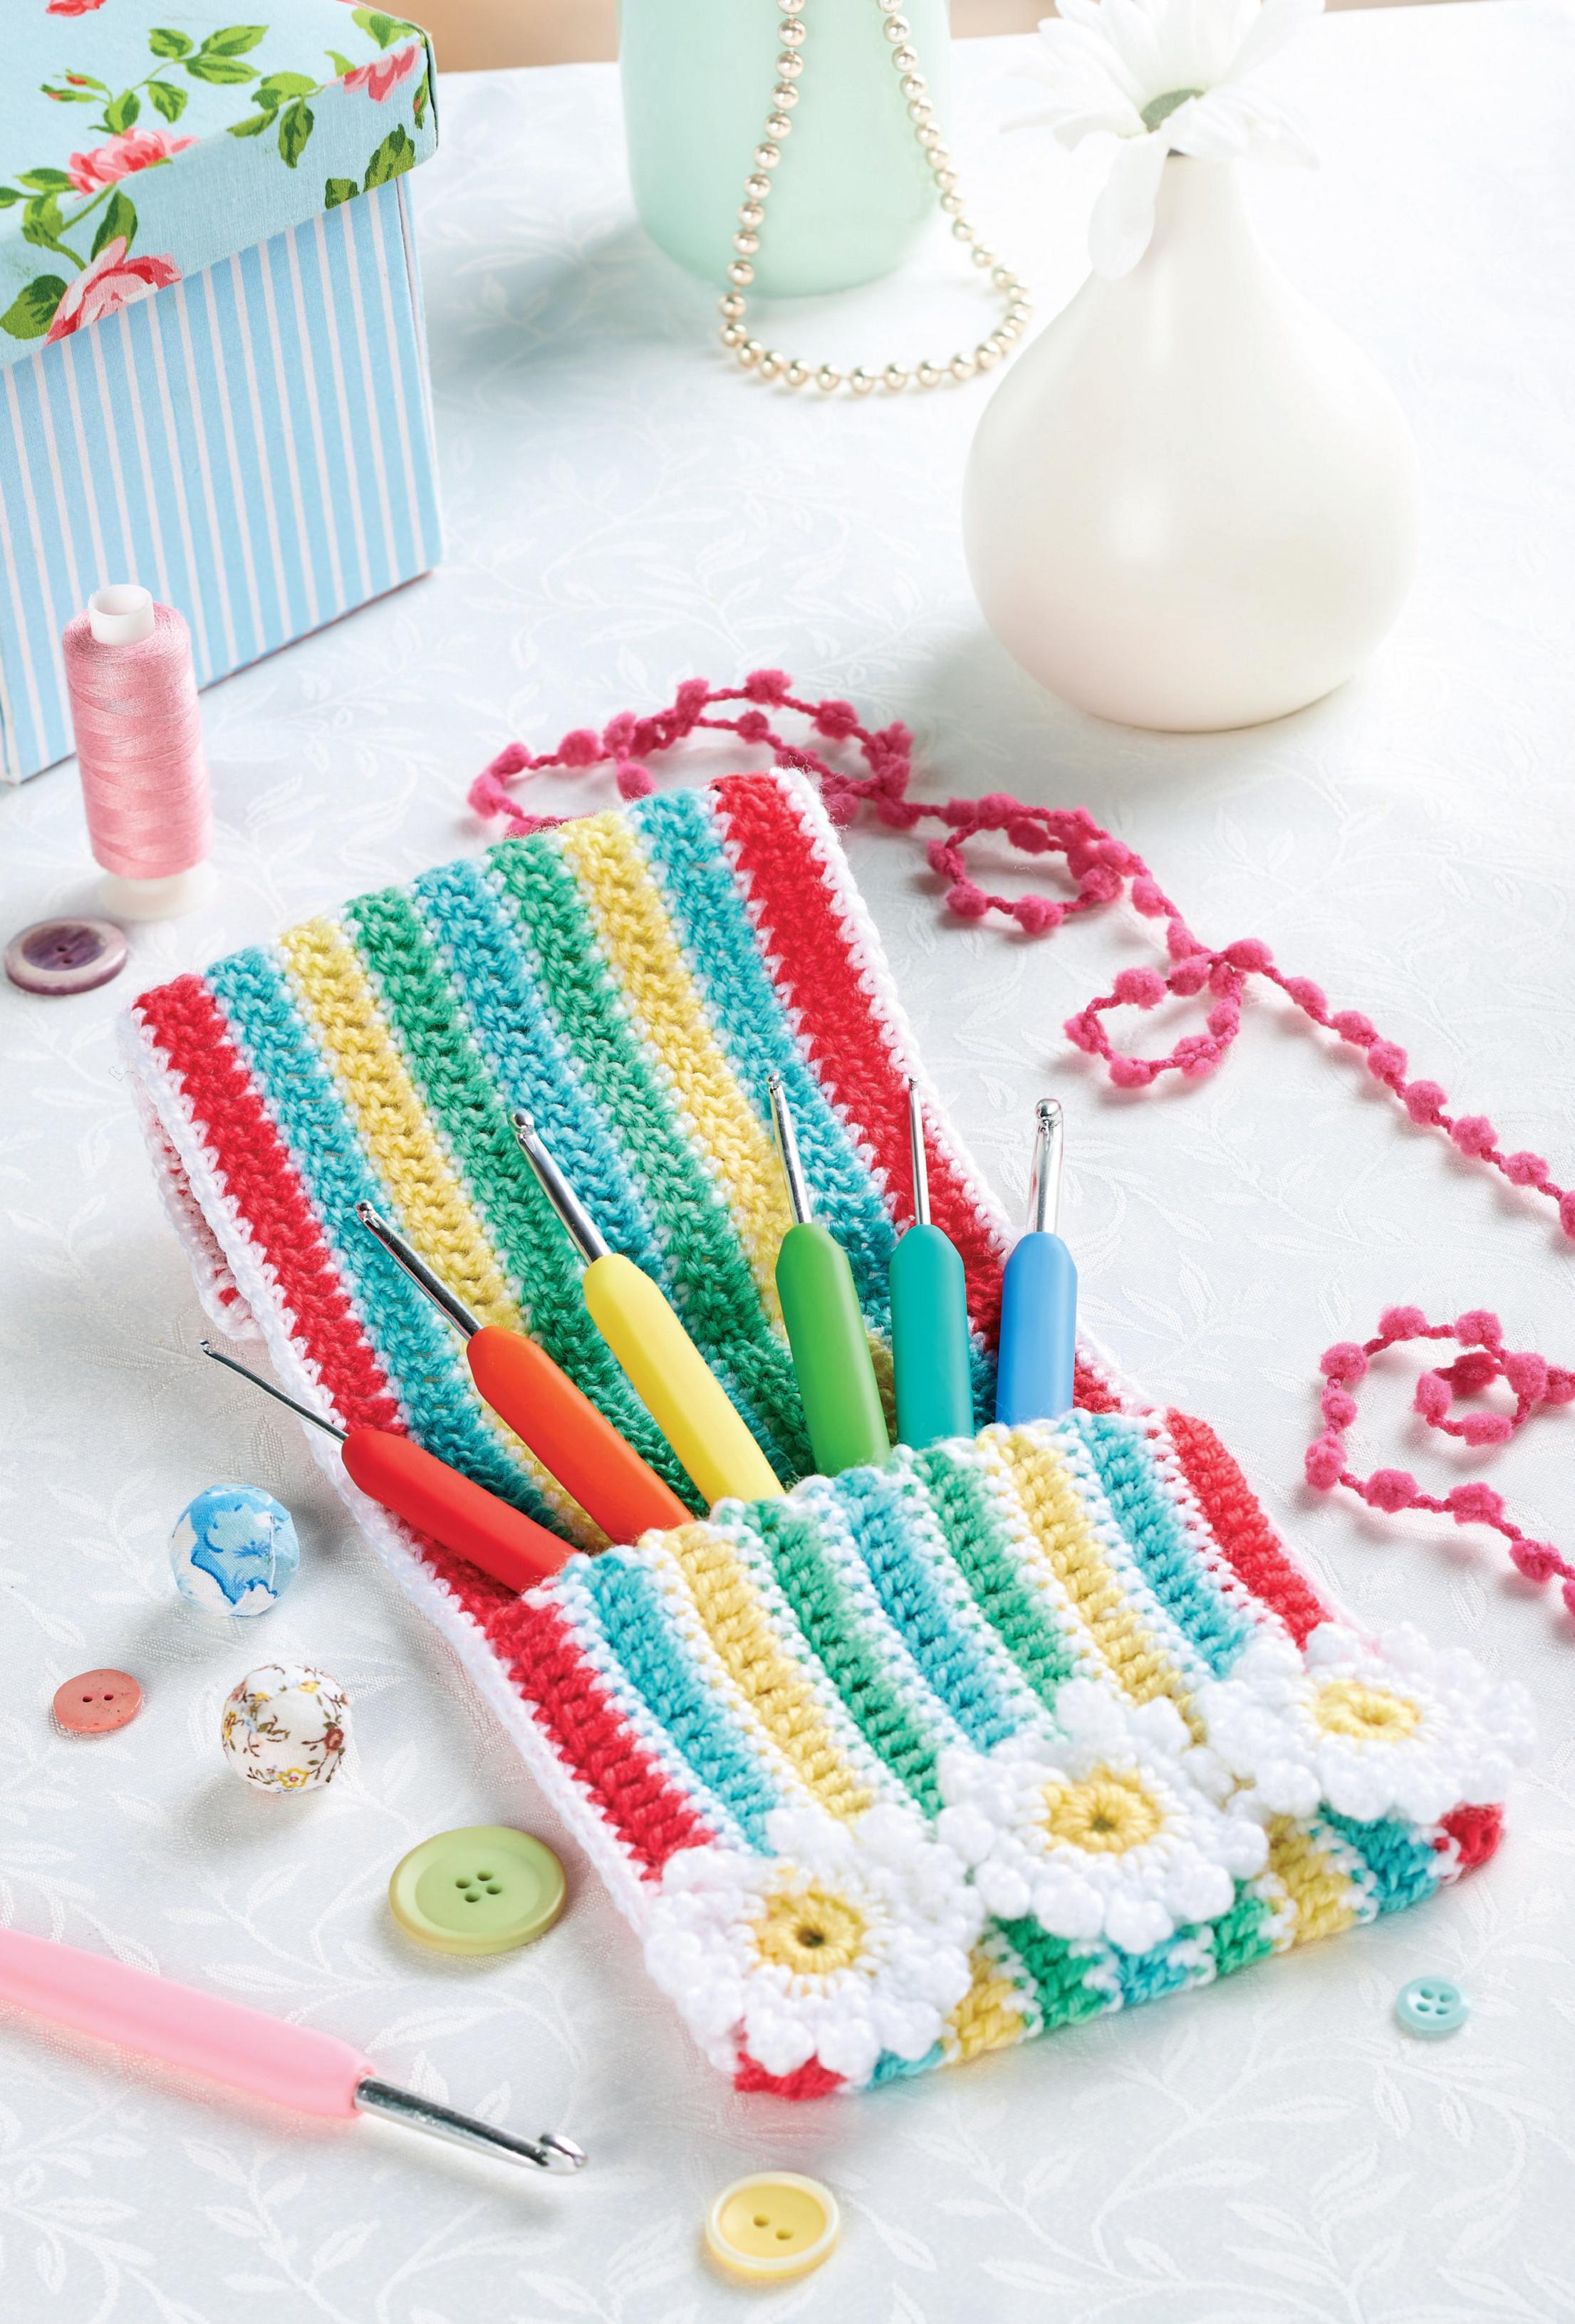 Crochet Hook Case Top Crochet Patterns